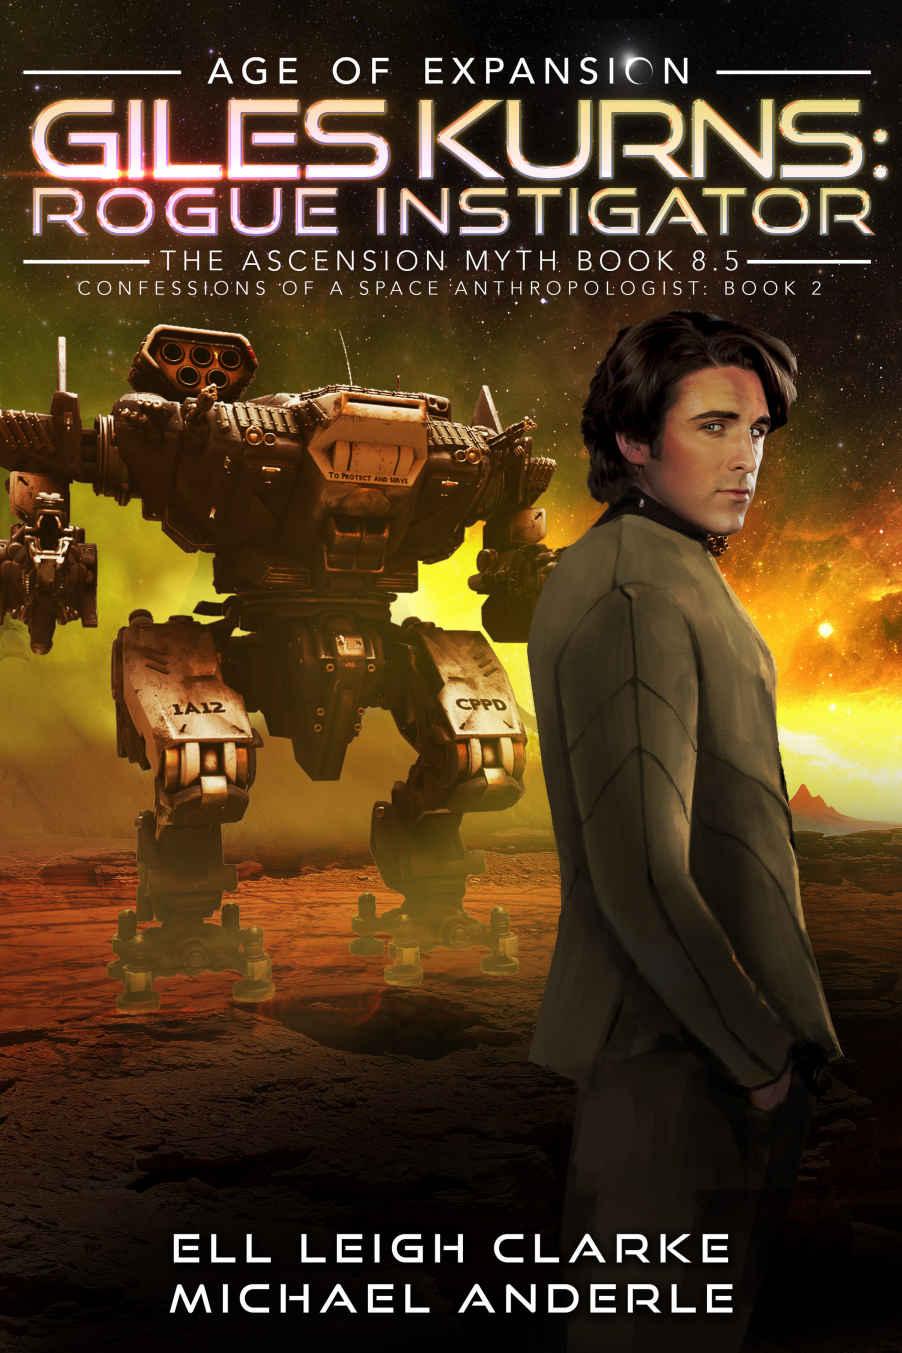 Giles Kurns: Rogue Instigator: Age Of Expansion